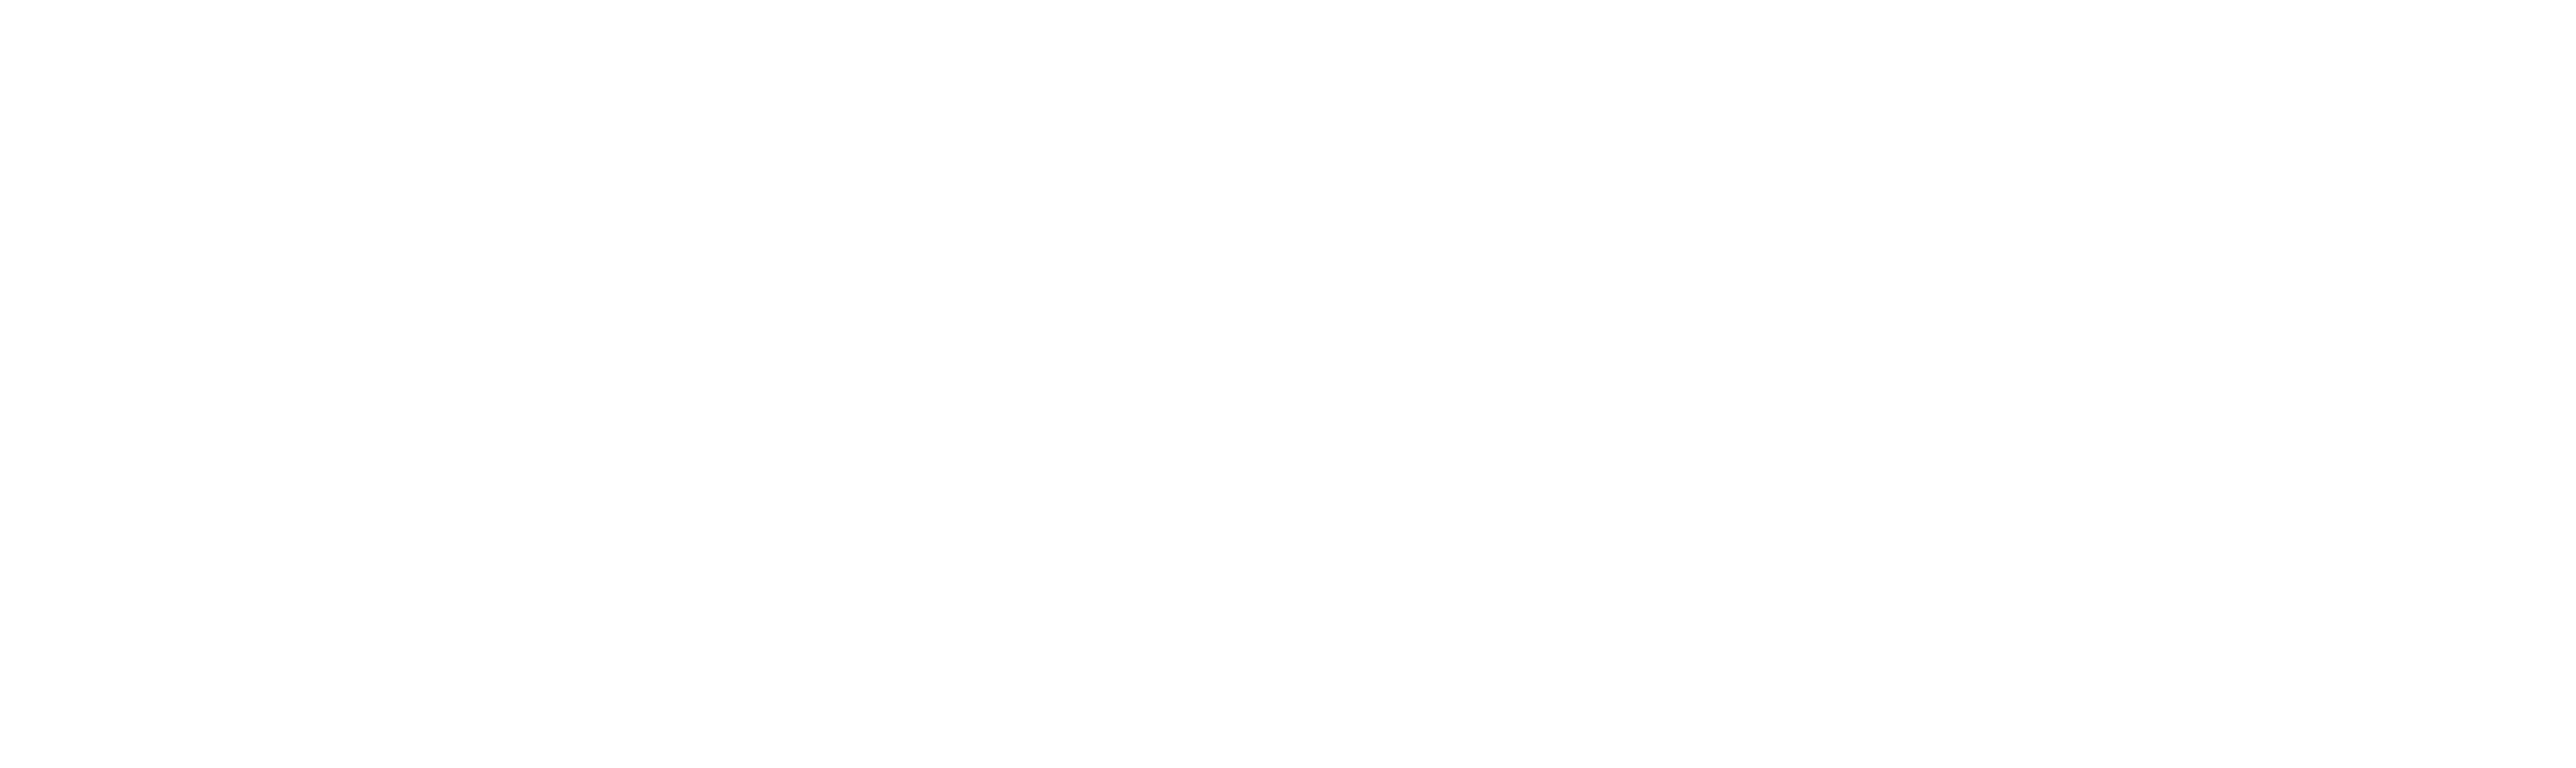 ZUKUNFT PASSIERT